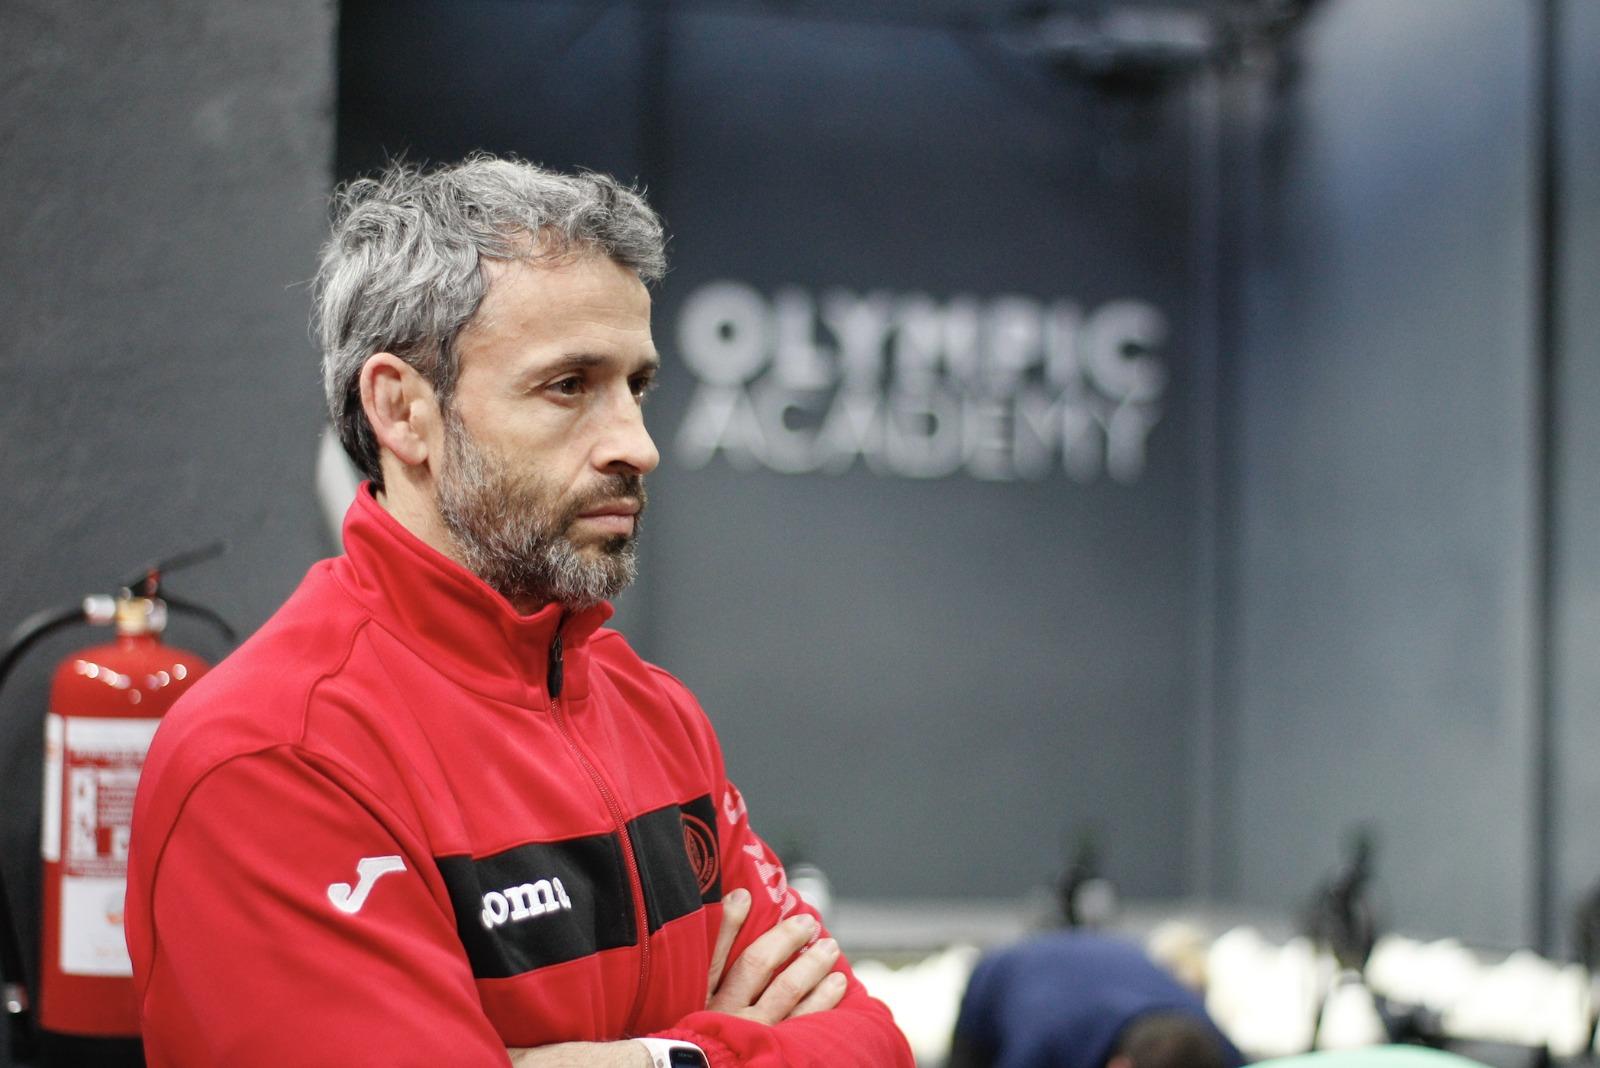 Oscar Sanchez-Silva Santiago